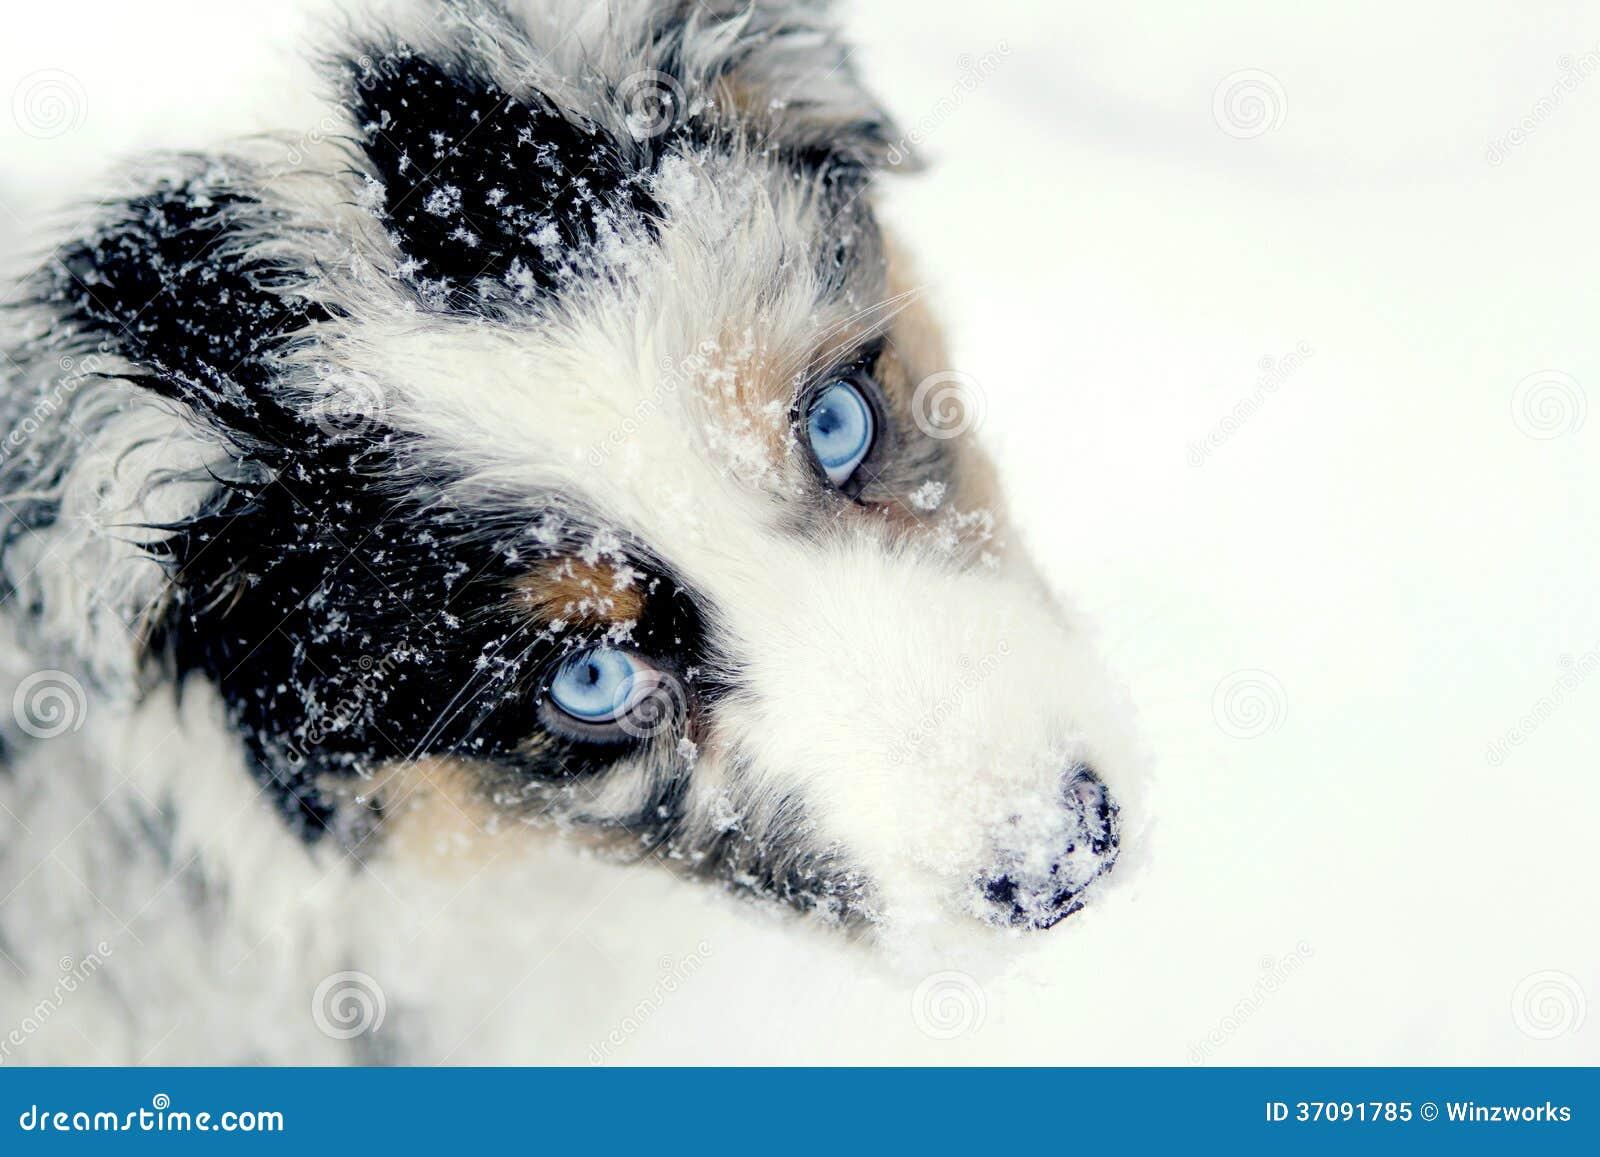 Australian Shepherd pup in snow